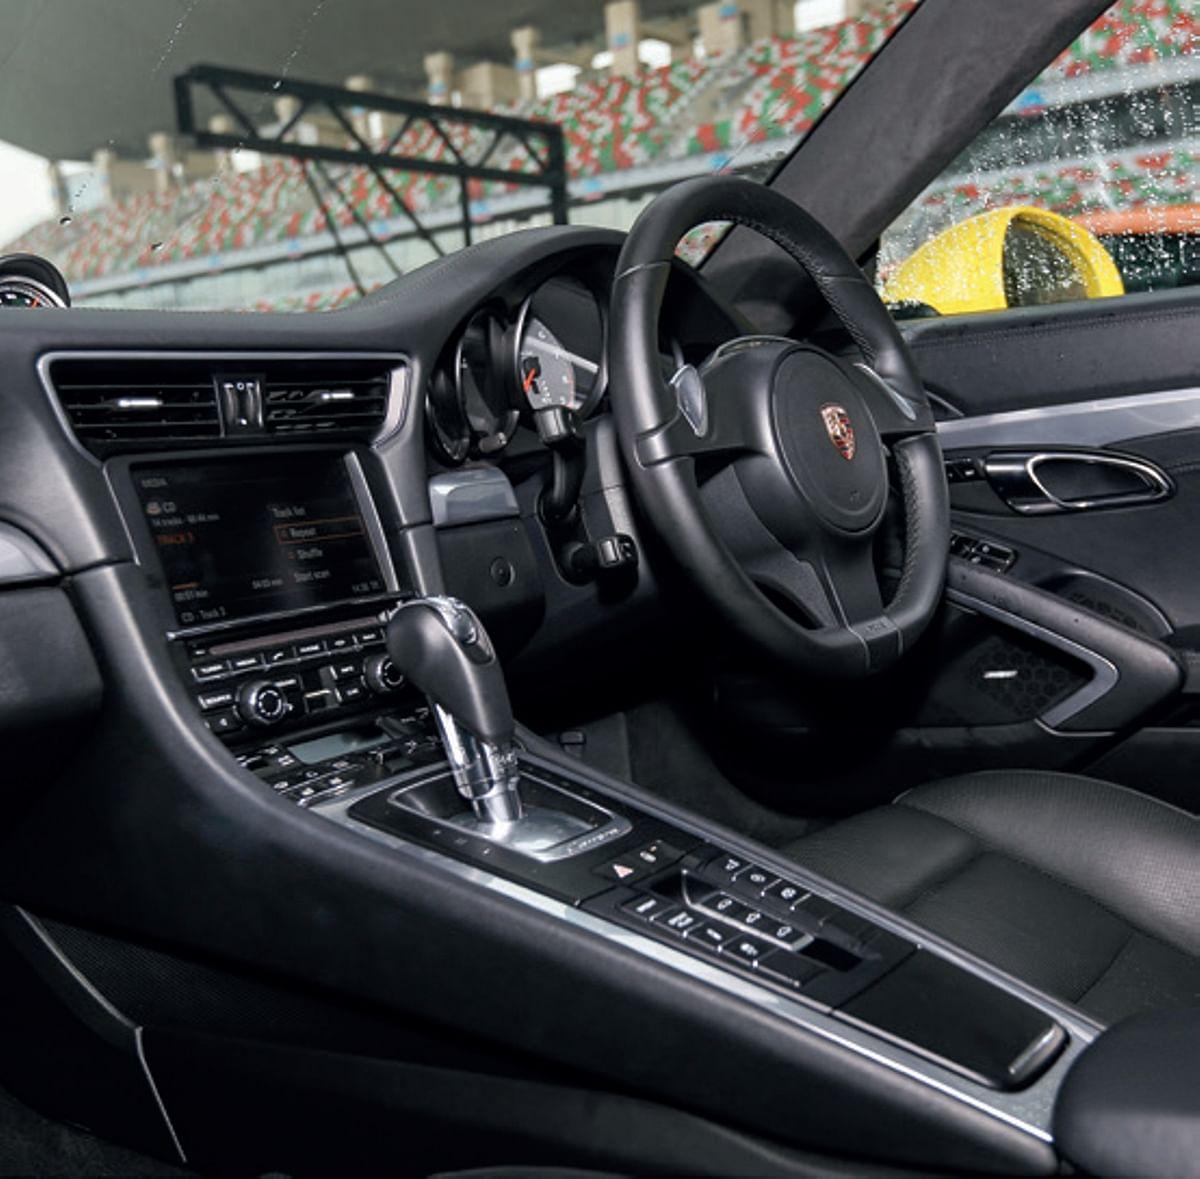 Cabin of the 991-generation Porsche 911